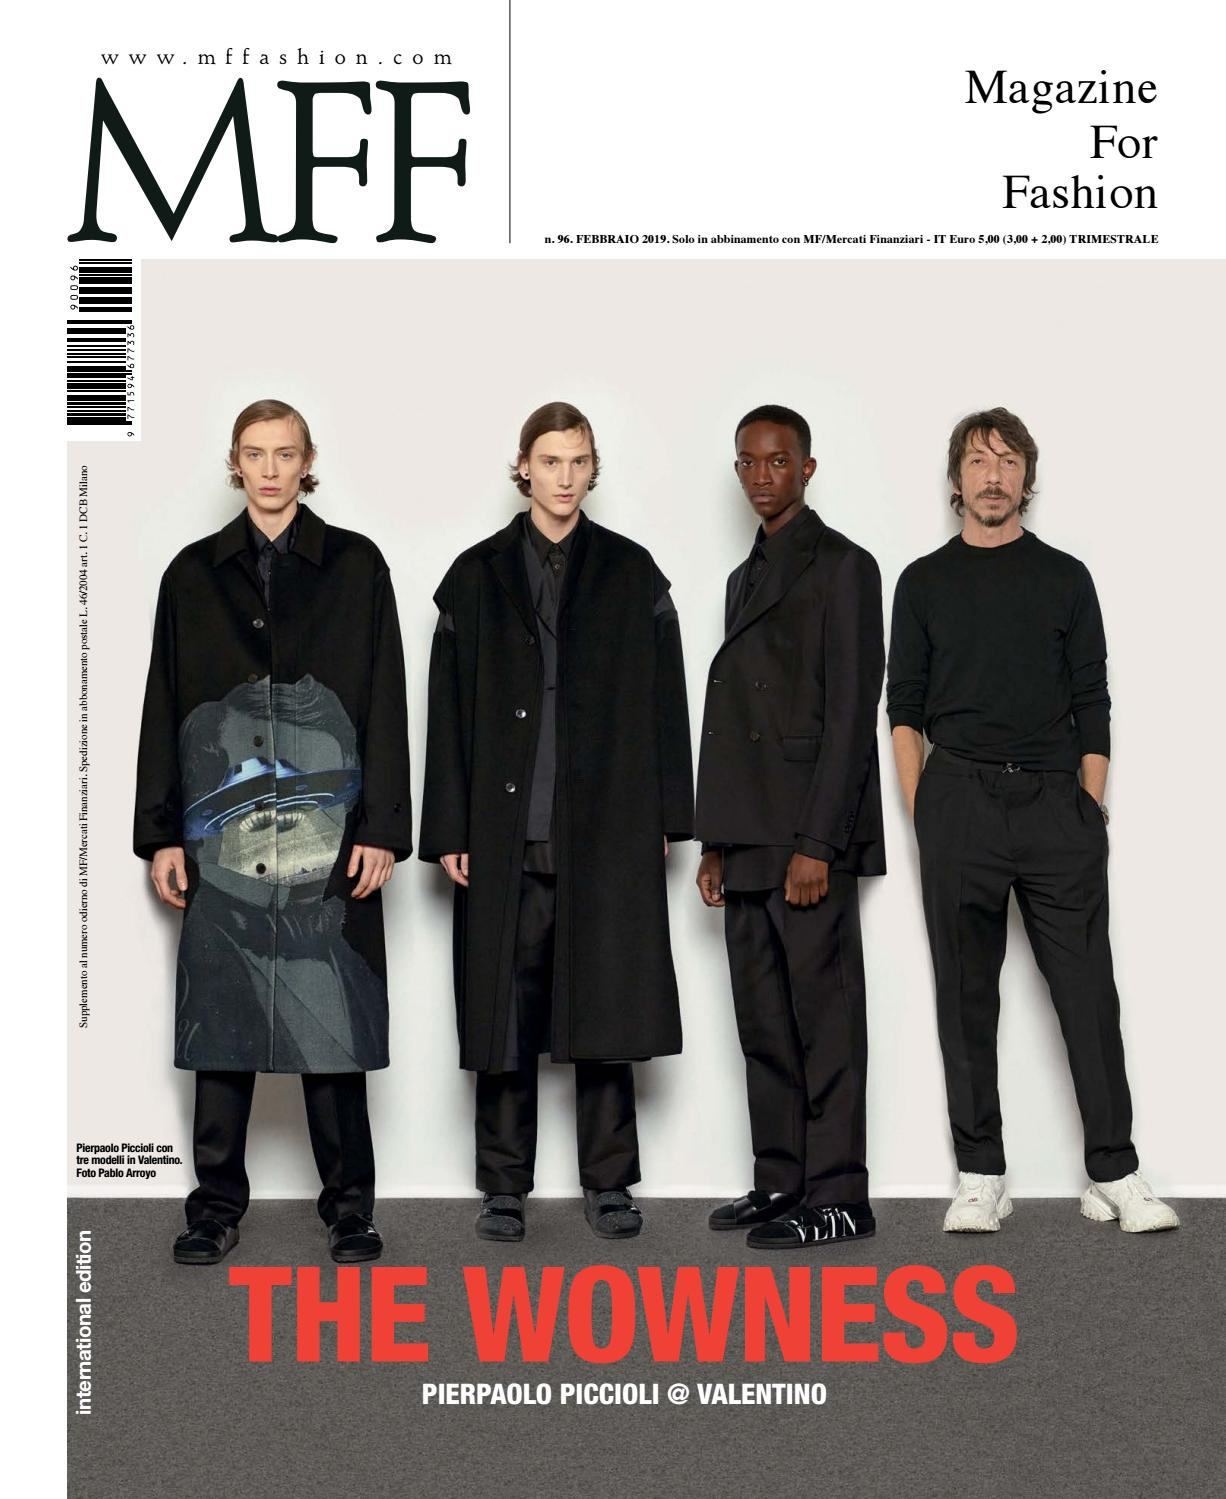 Mff Issuu Fashion For Class 96 Magazine By Editori mwnvN80O